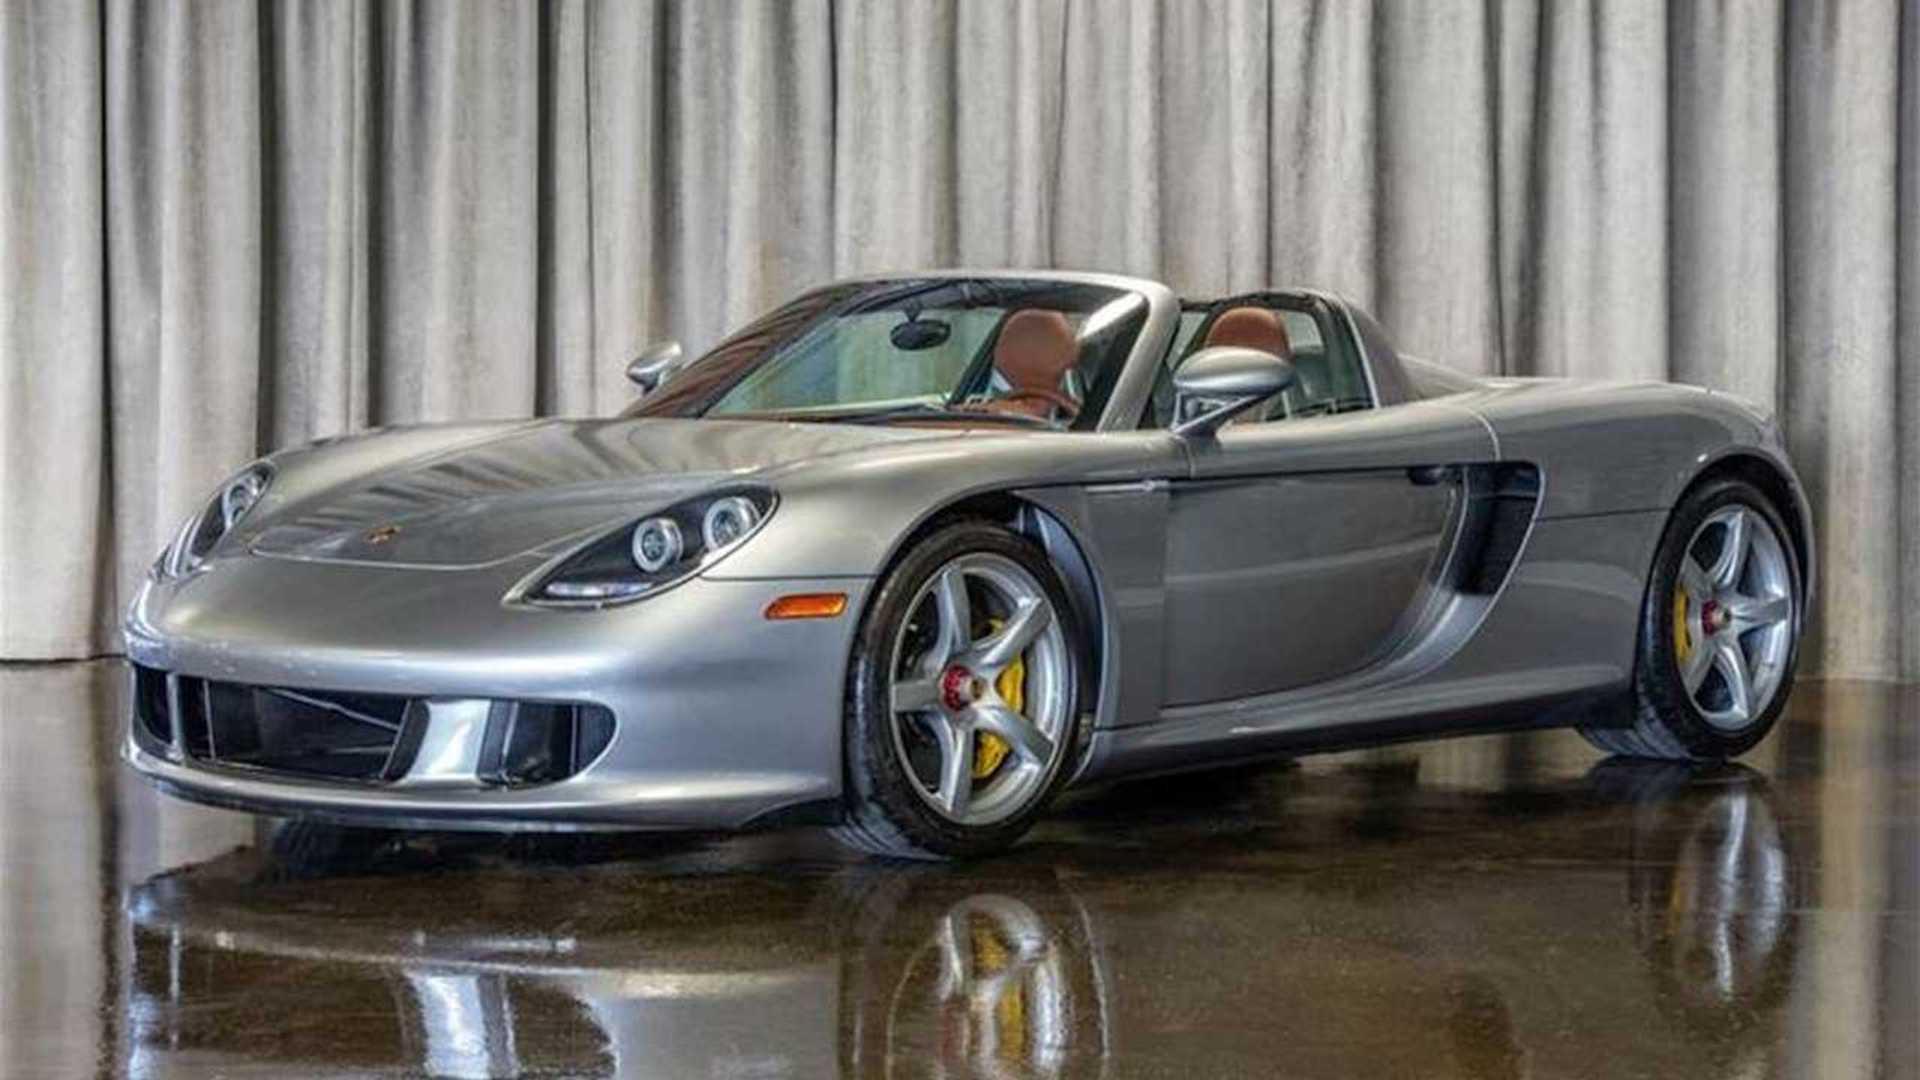 69-Mile Porsche Carrera GT For Sale Looks Factory-Fresh